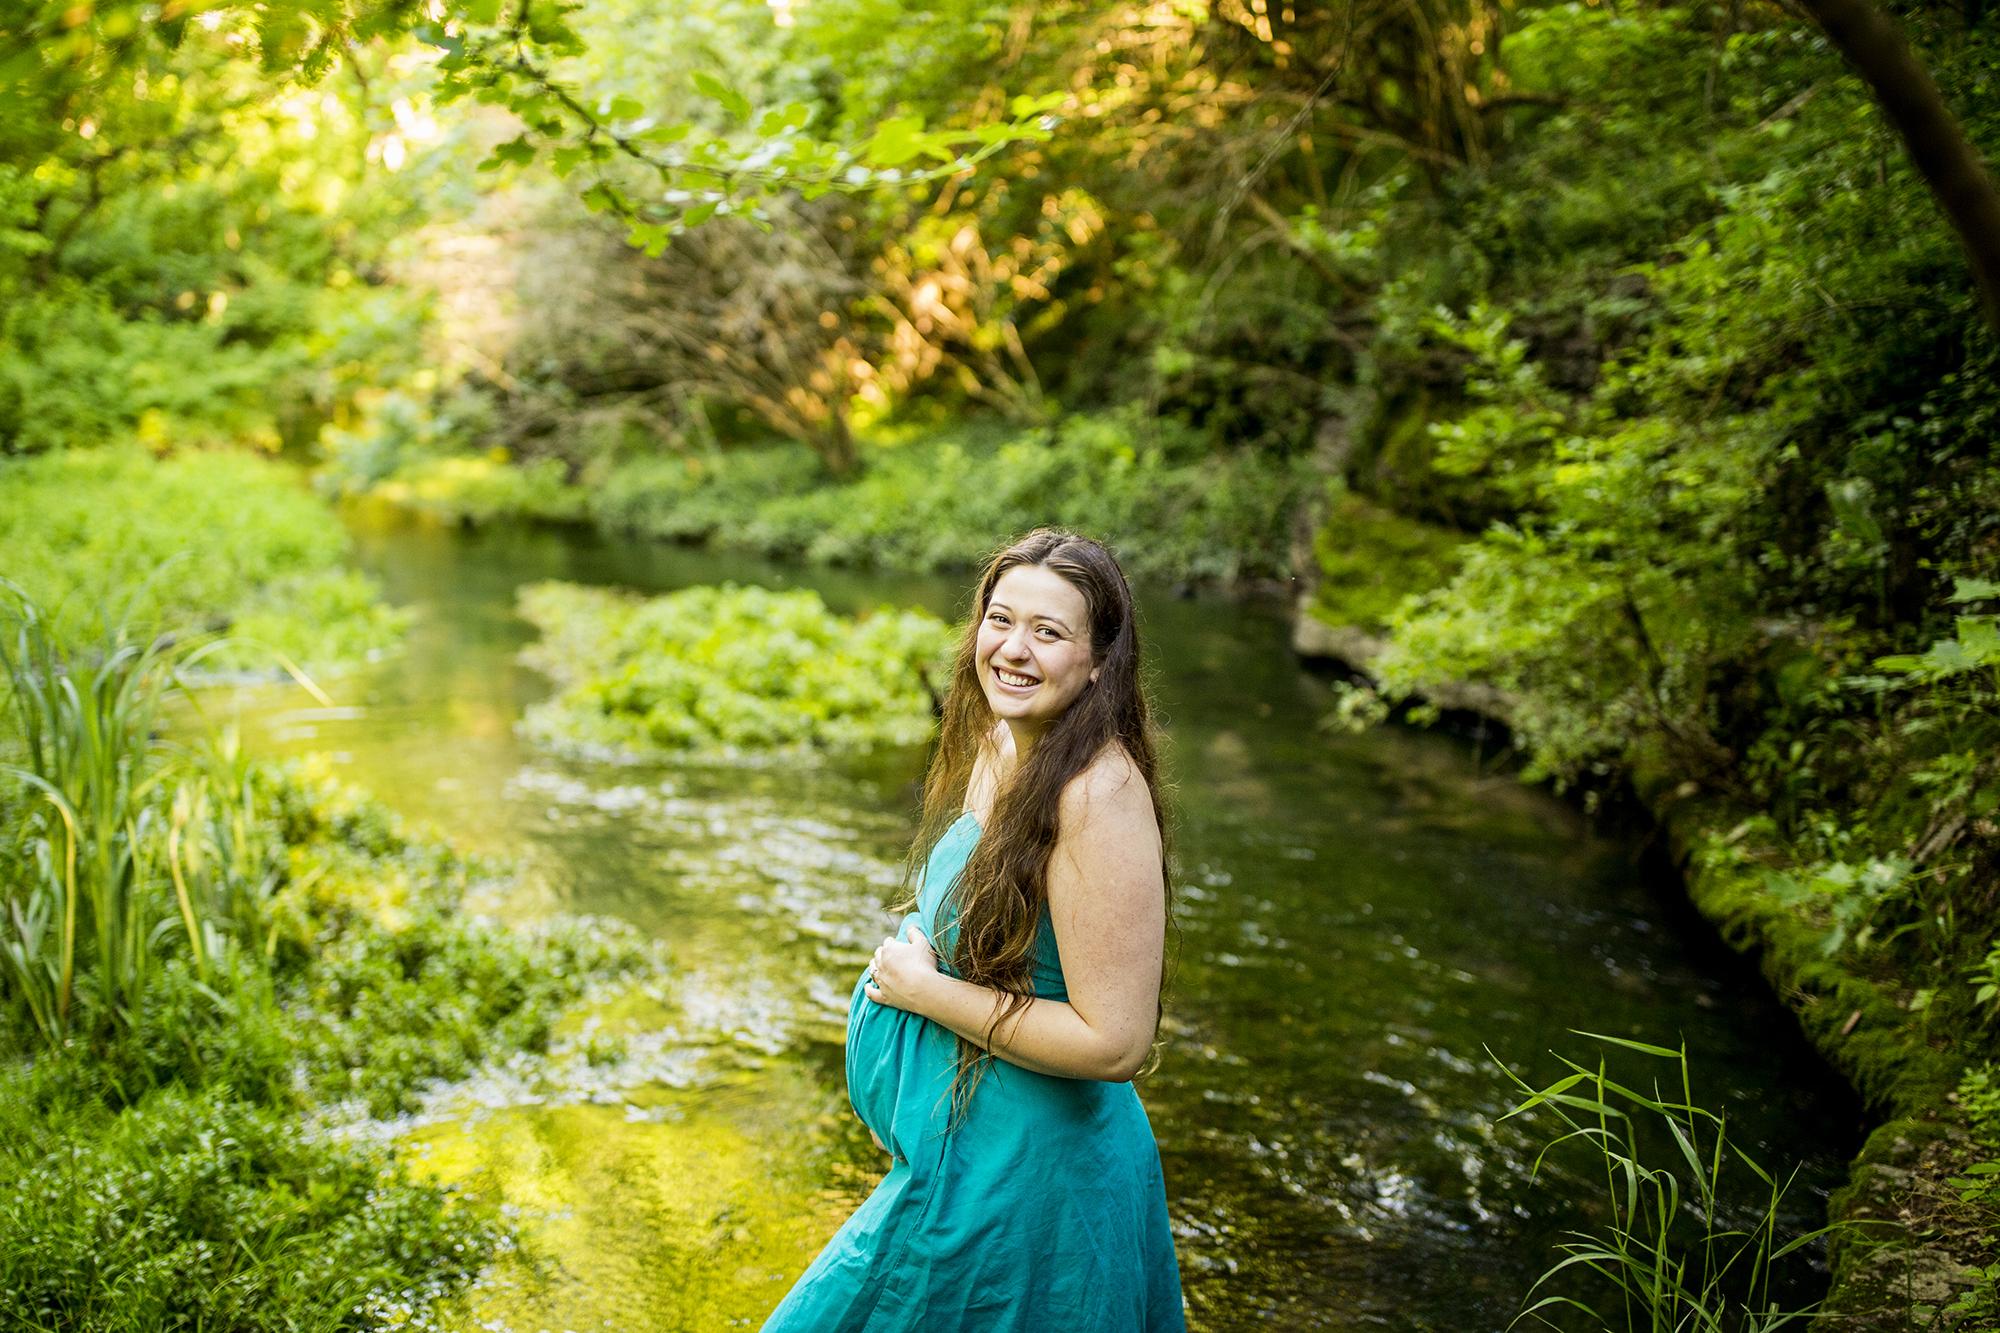 Seriously_Sabrina_Photography_Lexington_Kentucky_Maternity_Portraits_McConnell_Springs_Pagano18.jpg